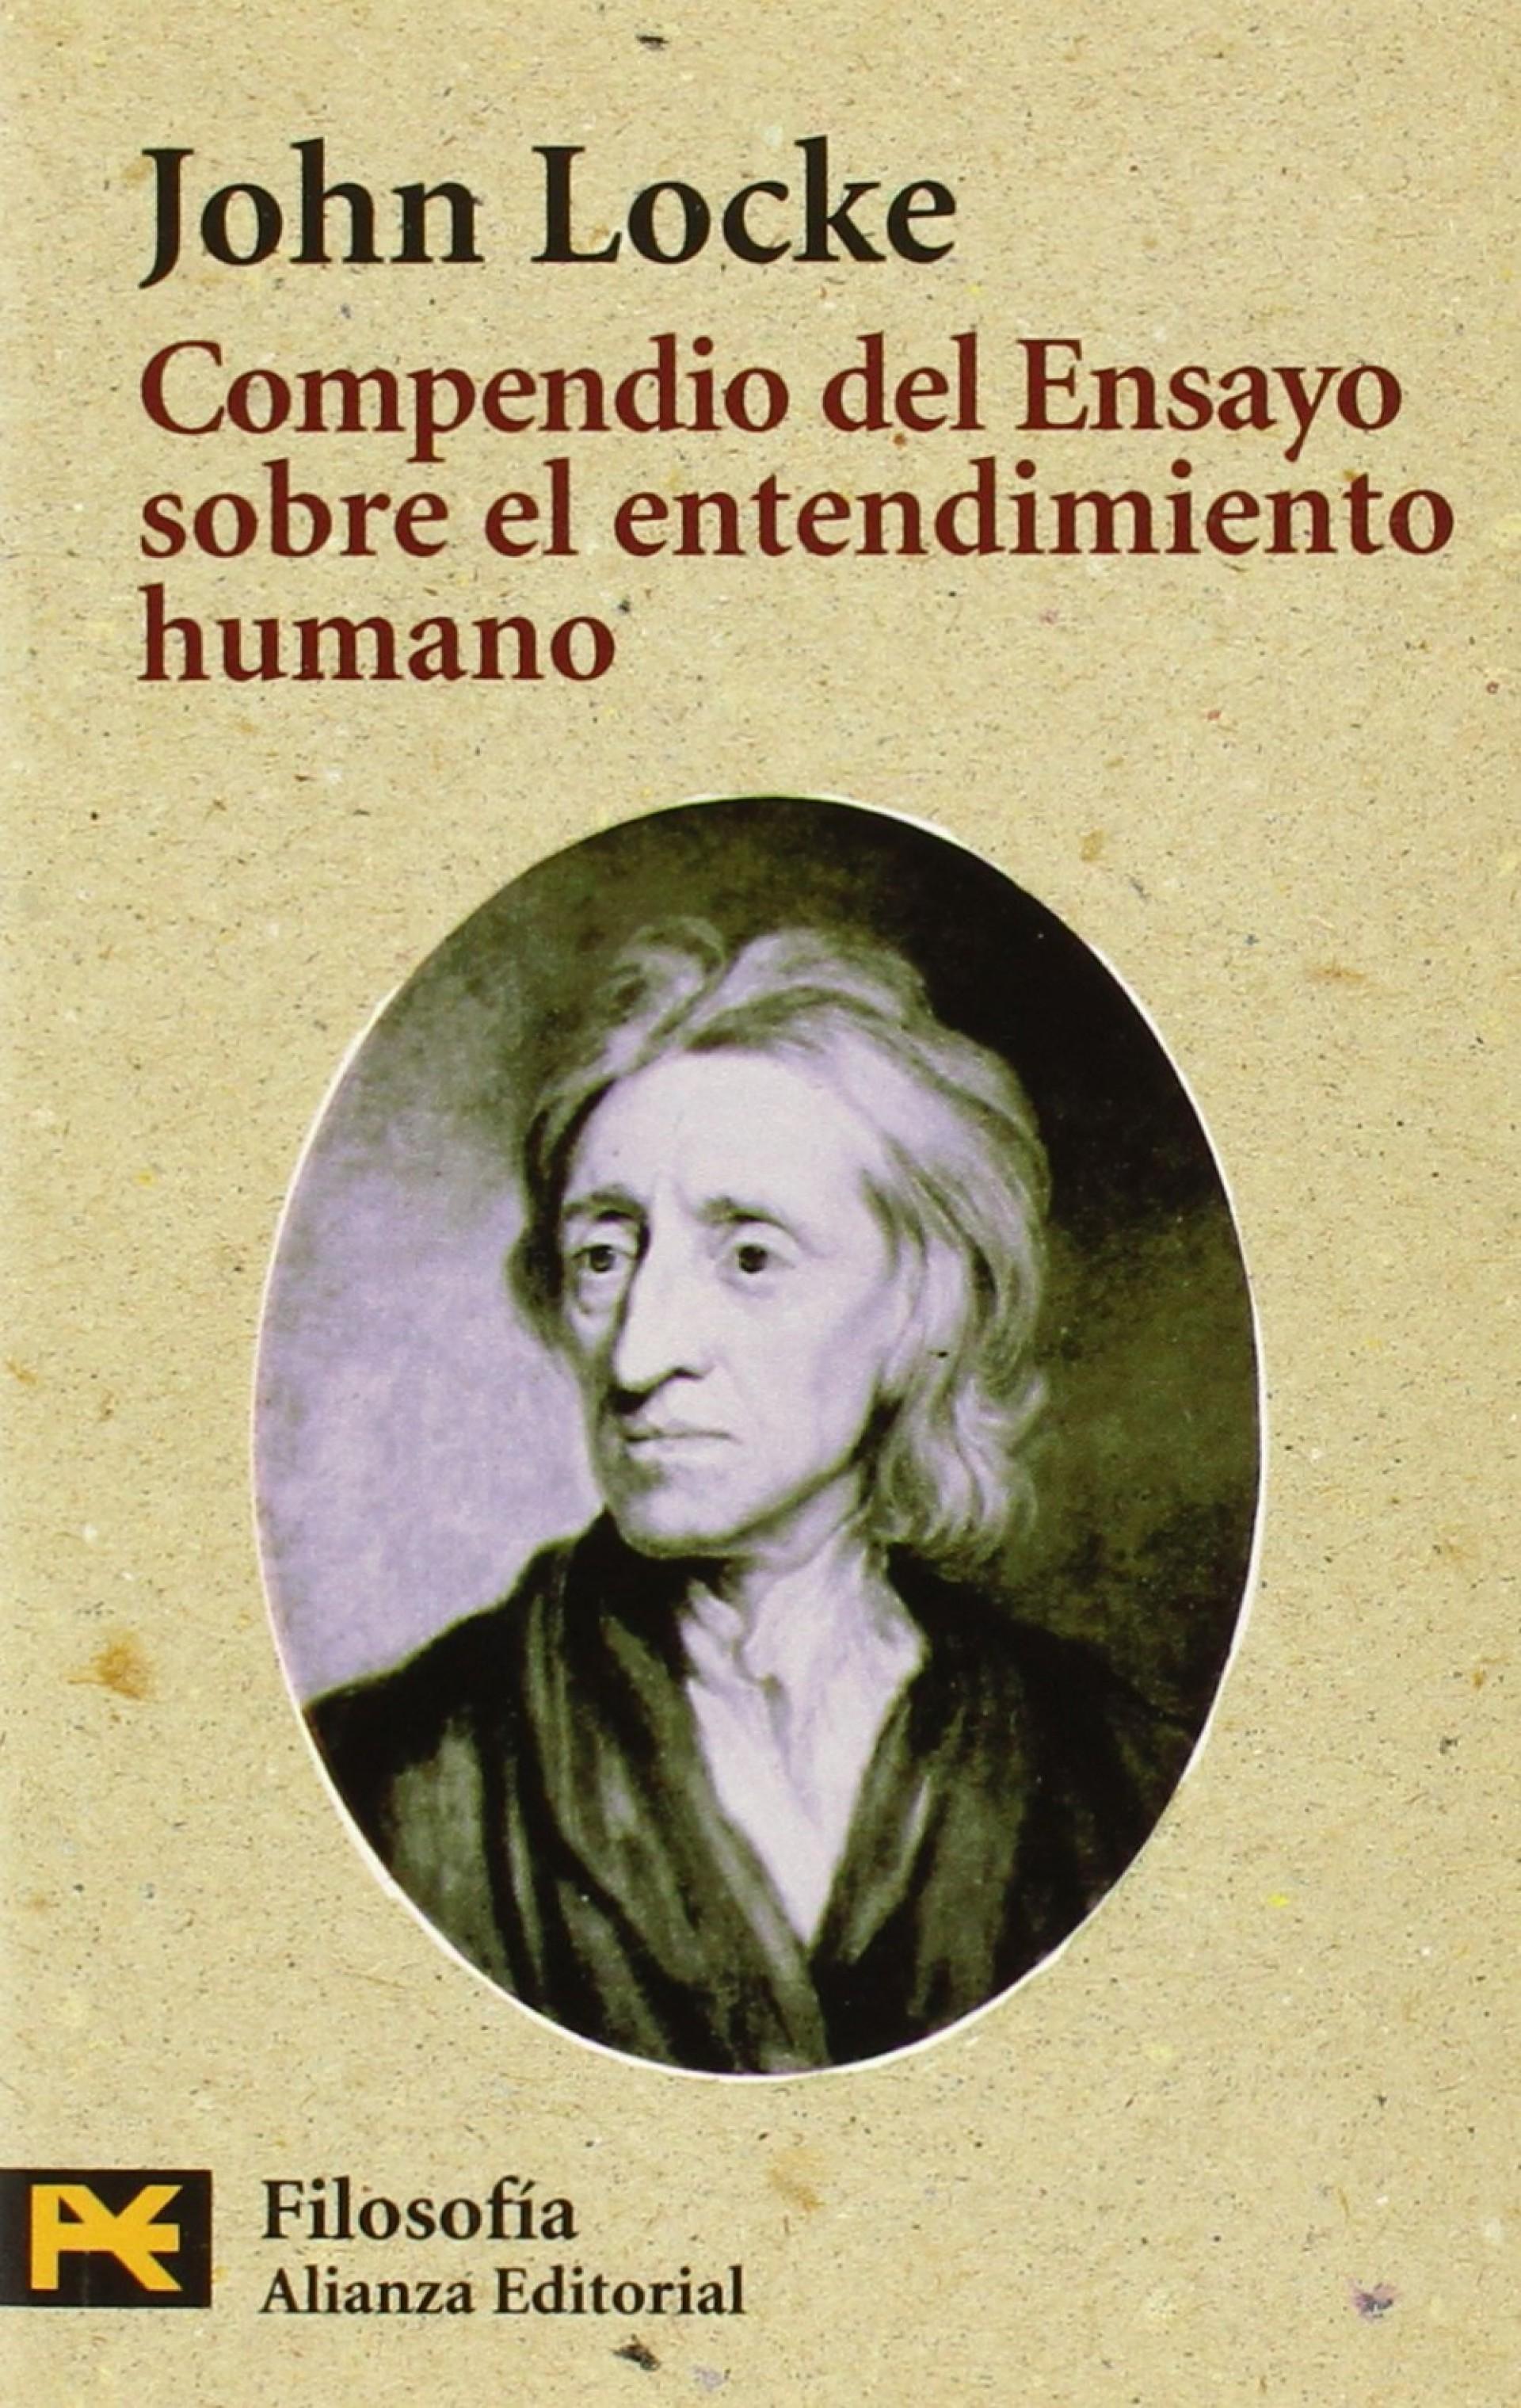 015 81o8ox7lzpl John Locke Essay Impressive Concerning Human Understanding Book 4 On Pdf Summary 1920